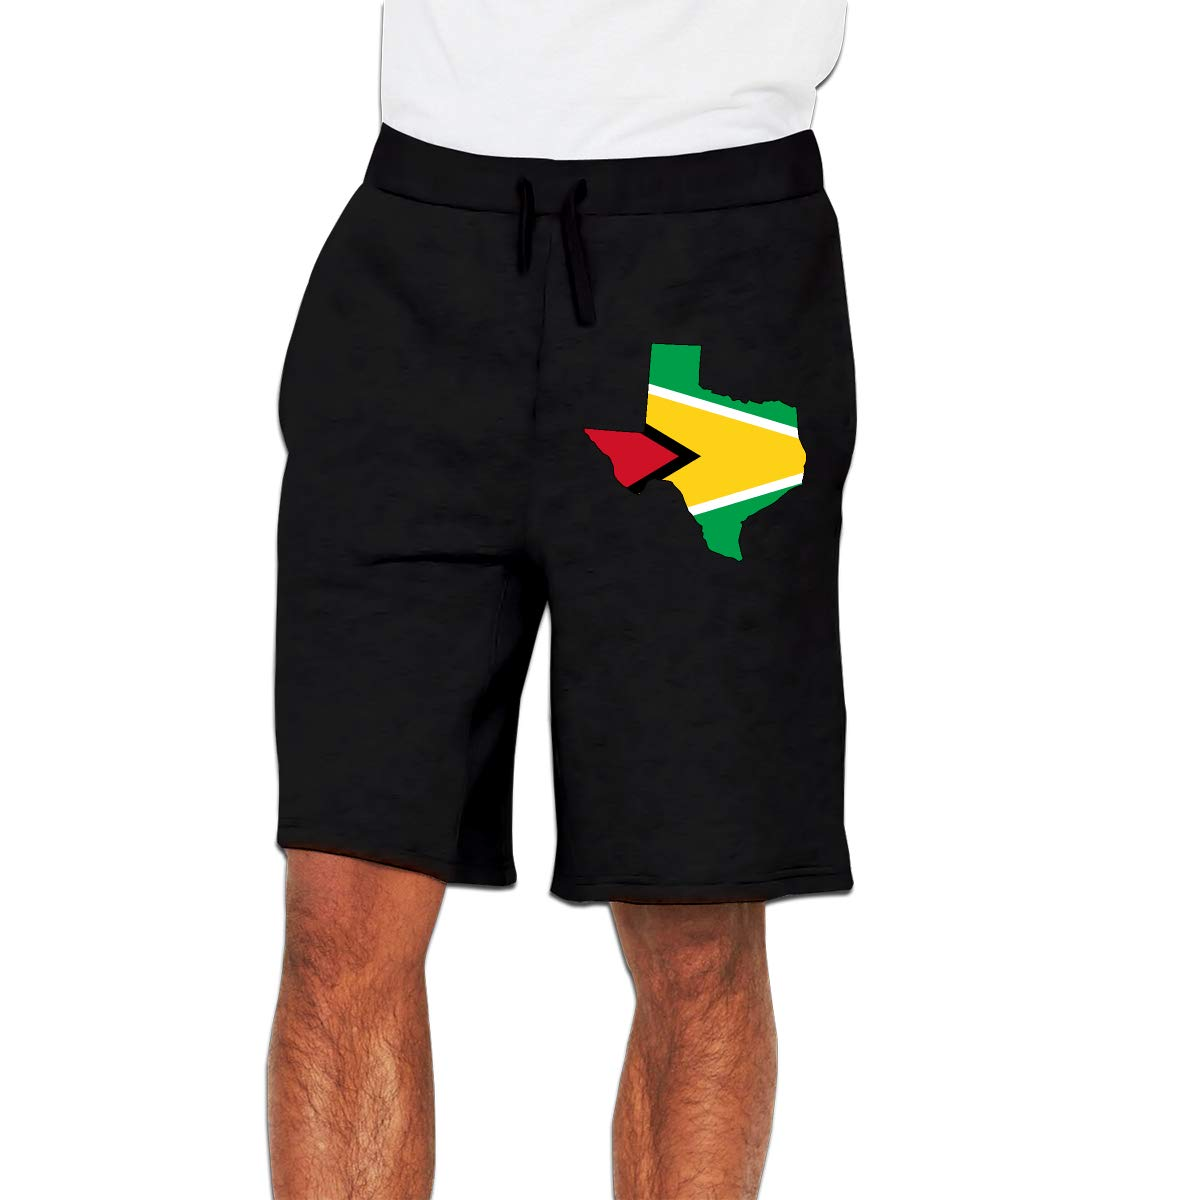 YDXC2FY Mens Boardshorts with Elastic Waist Drawstring Casual Sports Shorts Guyana Flag of Texas Map Patterned Swim Trunks